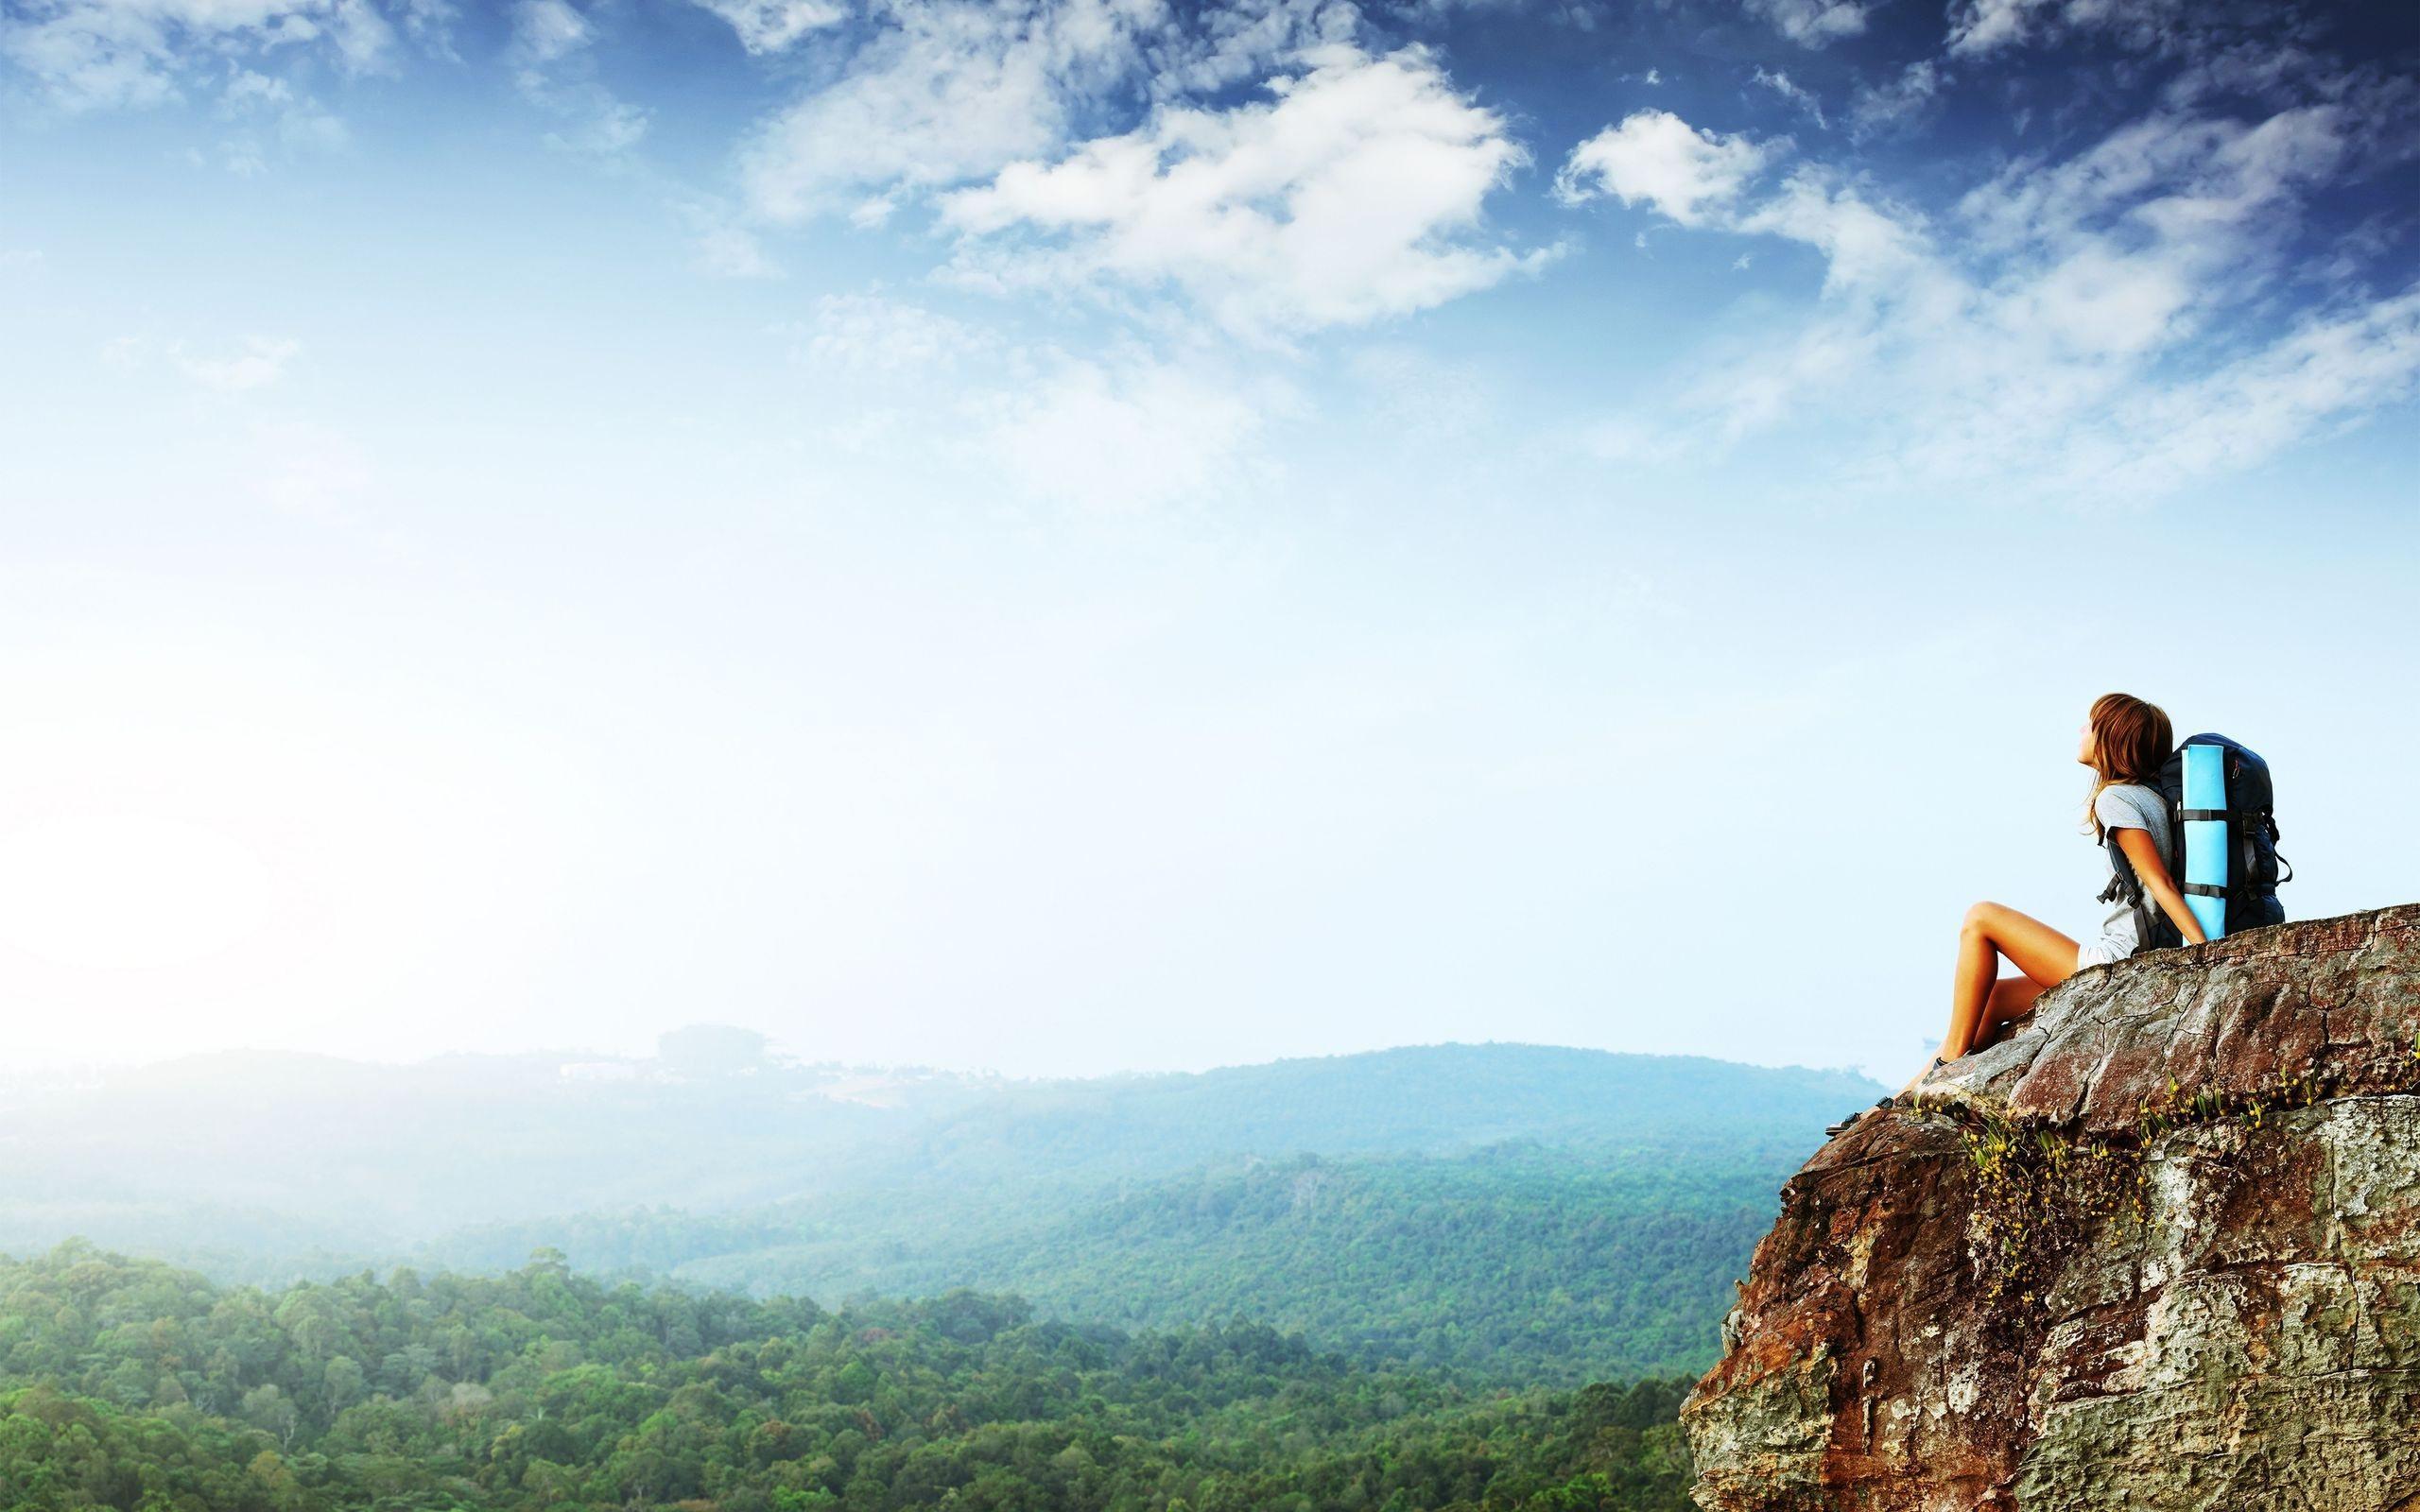 Beautiful Journey Wallpaper HD Widescreen